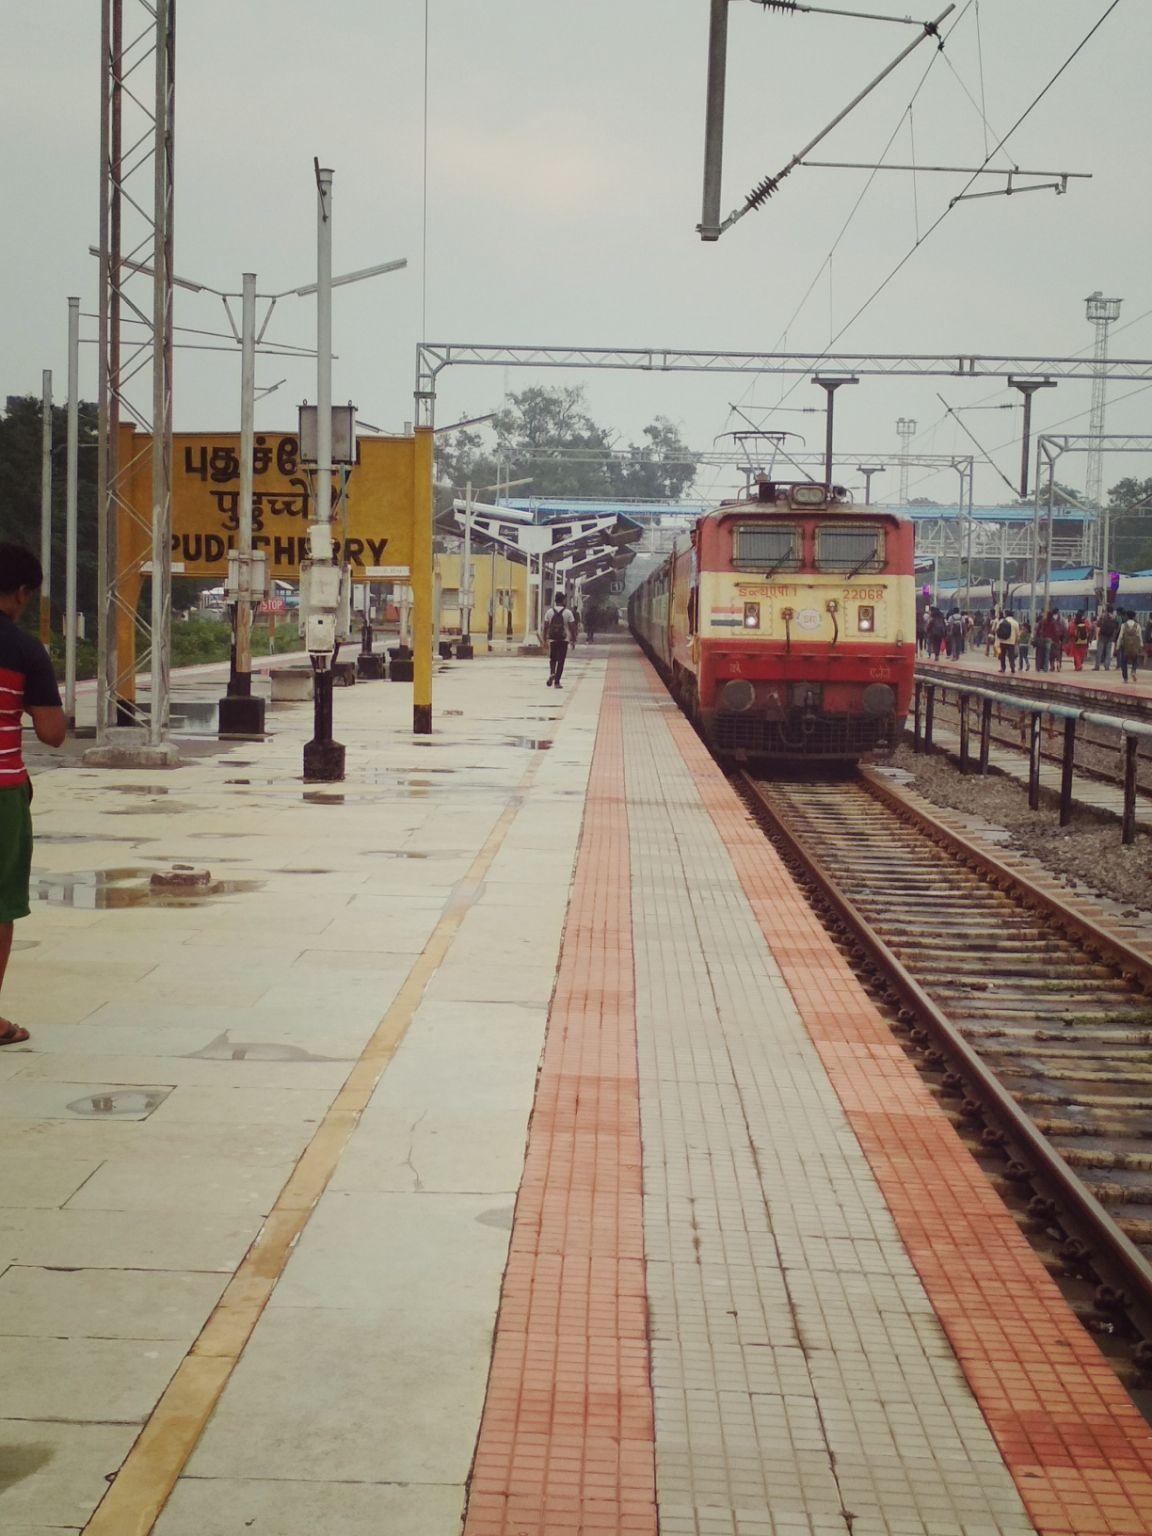 Photo of Puducherry By Smash